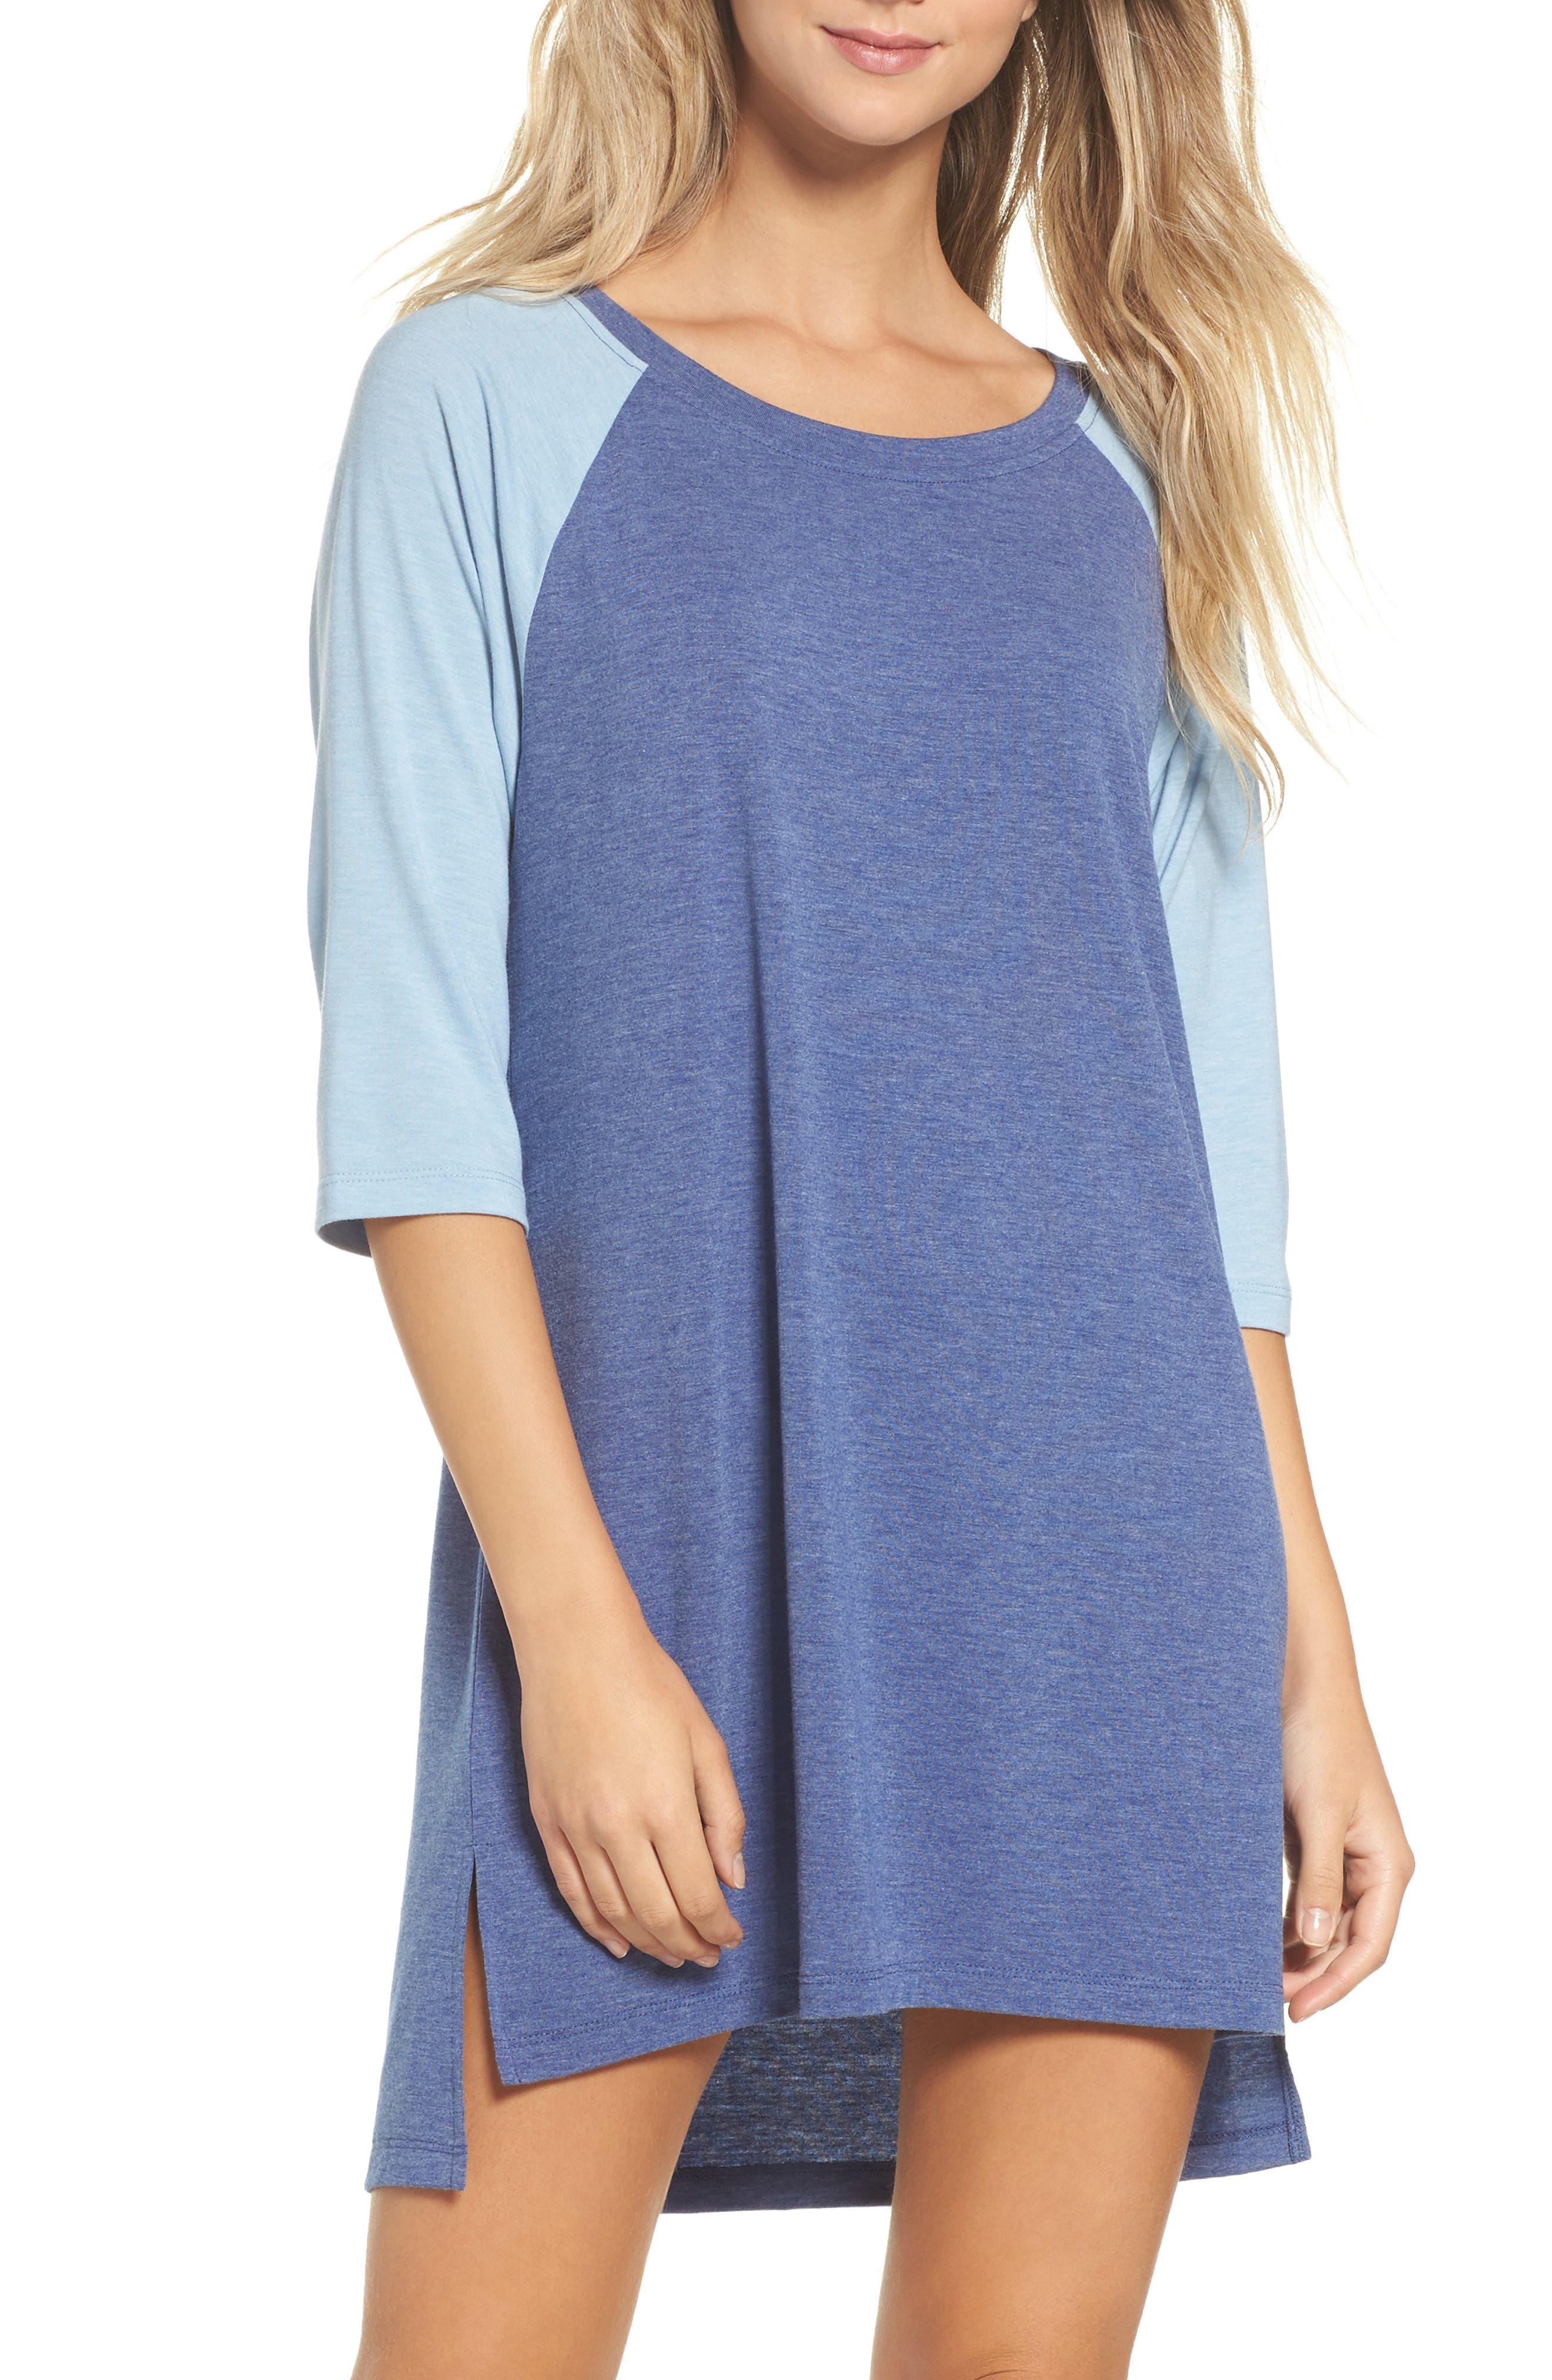 Honeydew All American Sleep Shirt